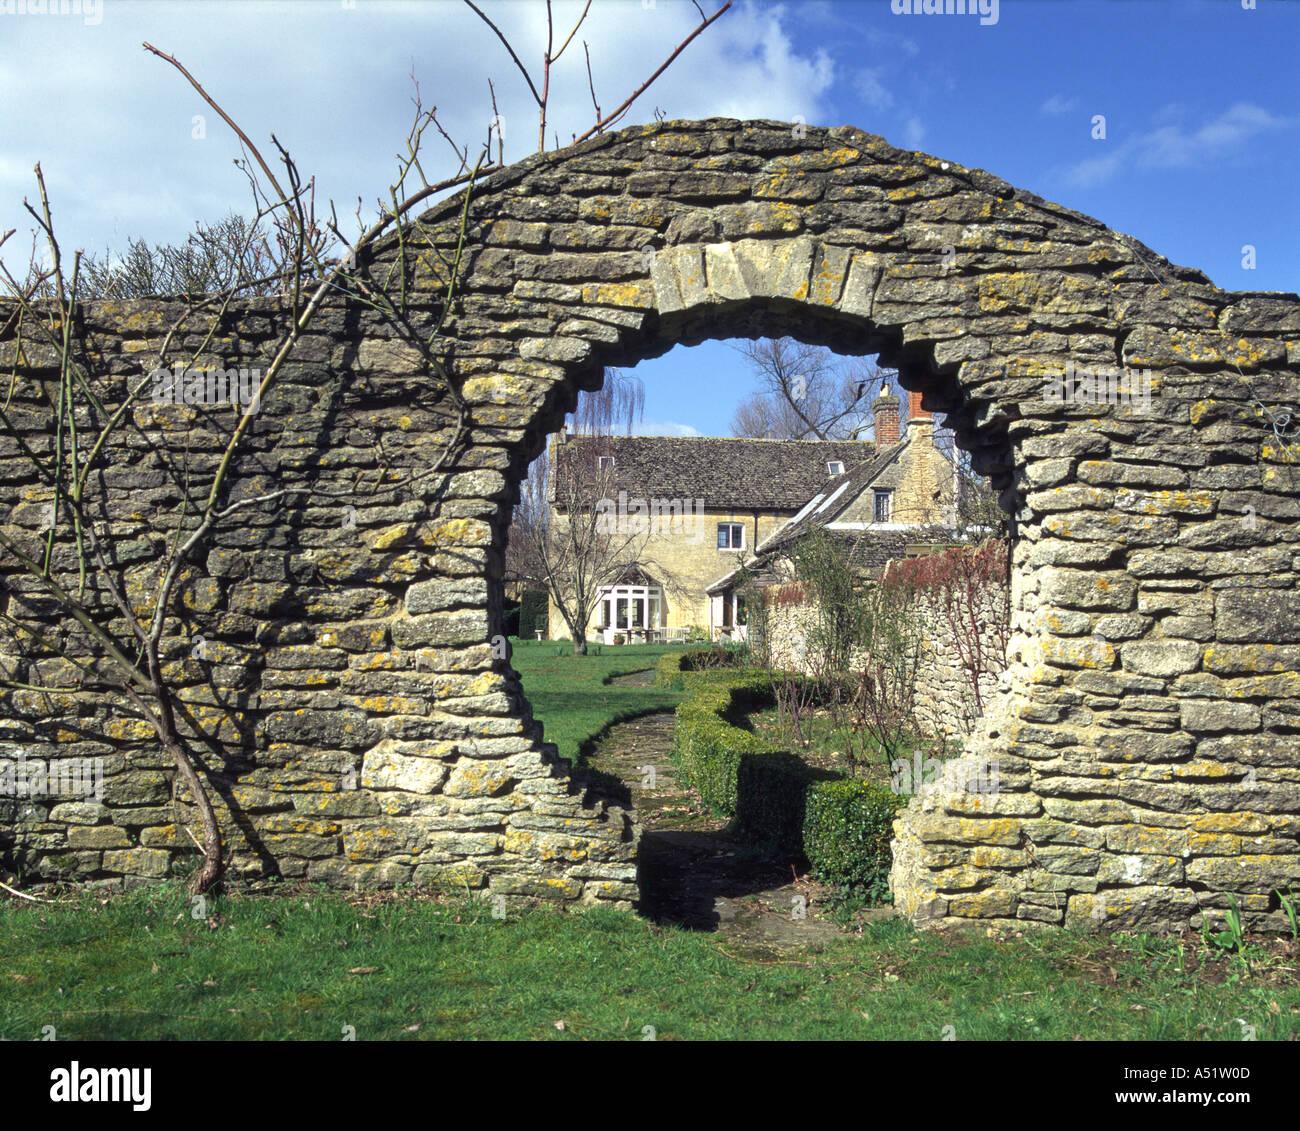 Keyhole Gate Way Through Stone Garden Wall